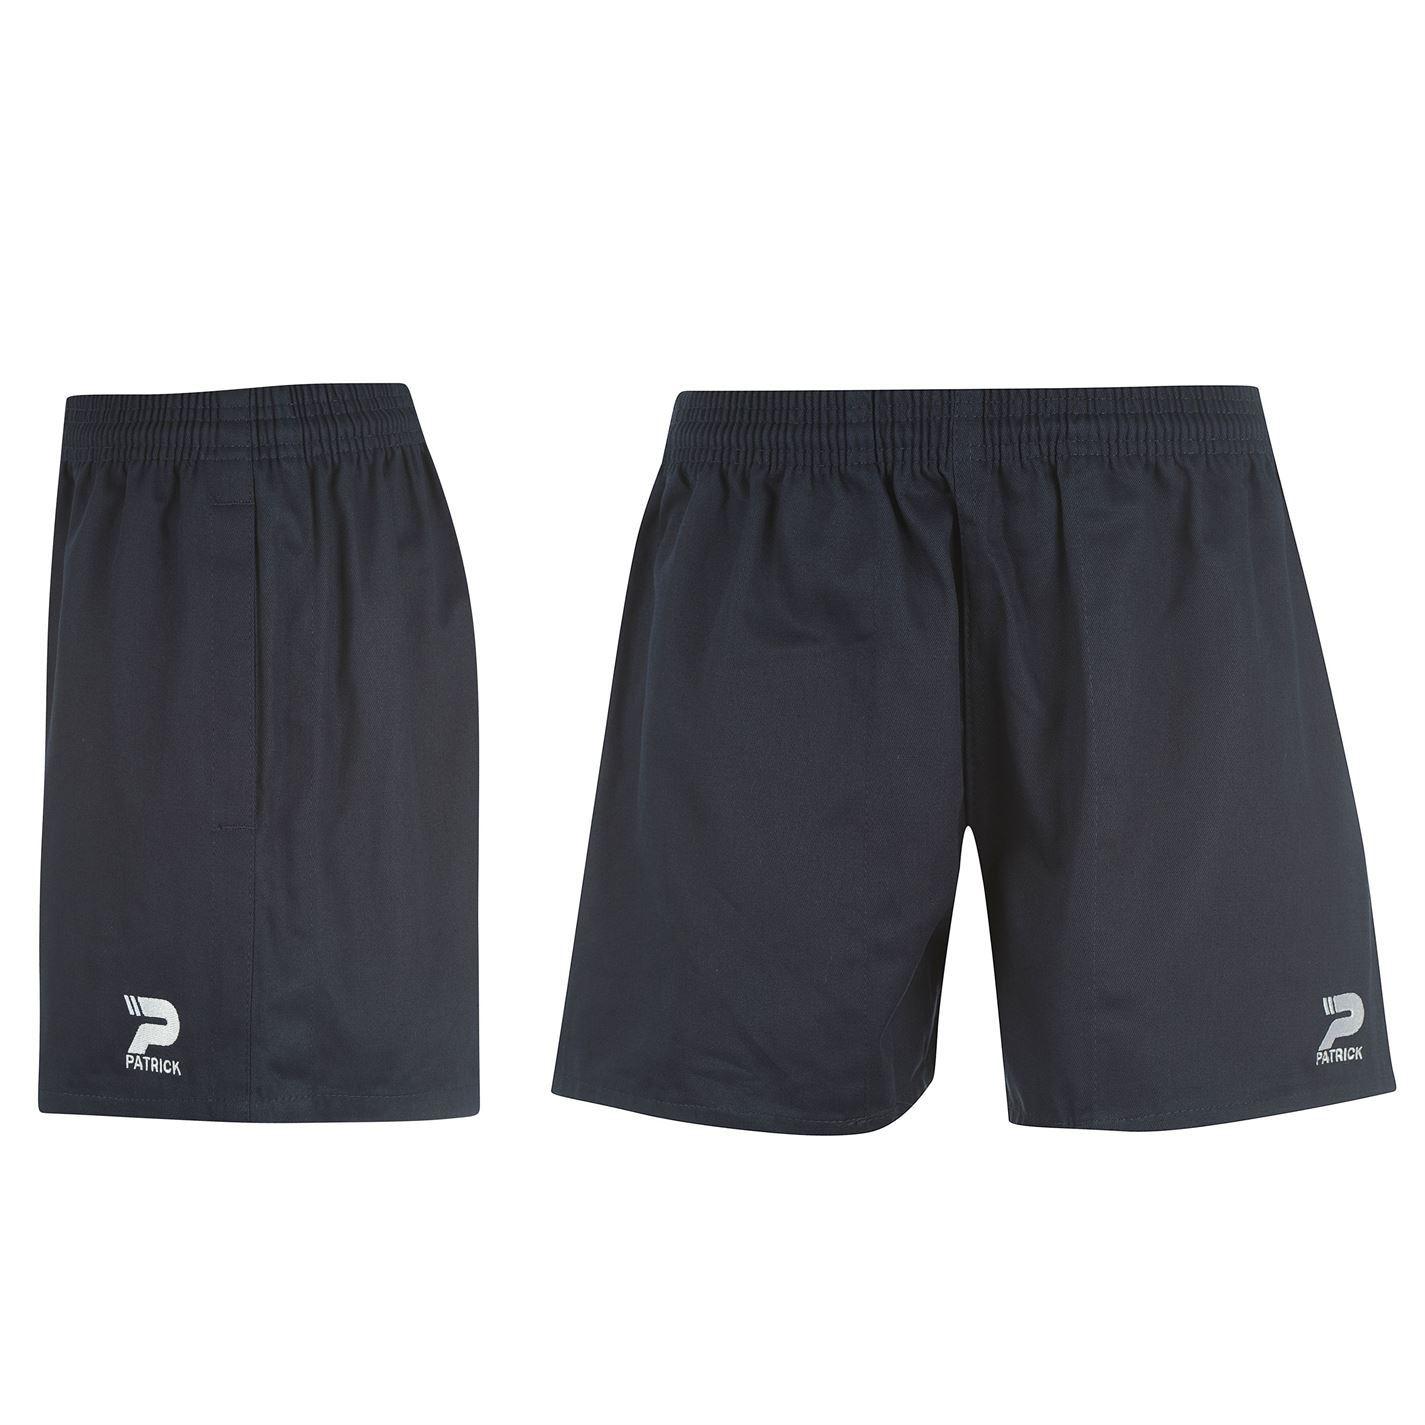 Patrick-Rugby-Shorts-Junior-Boys-Sports-Fan-Bottoms thumbnail 8